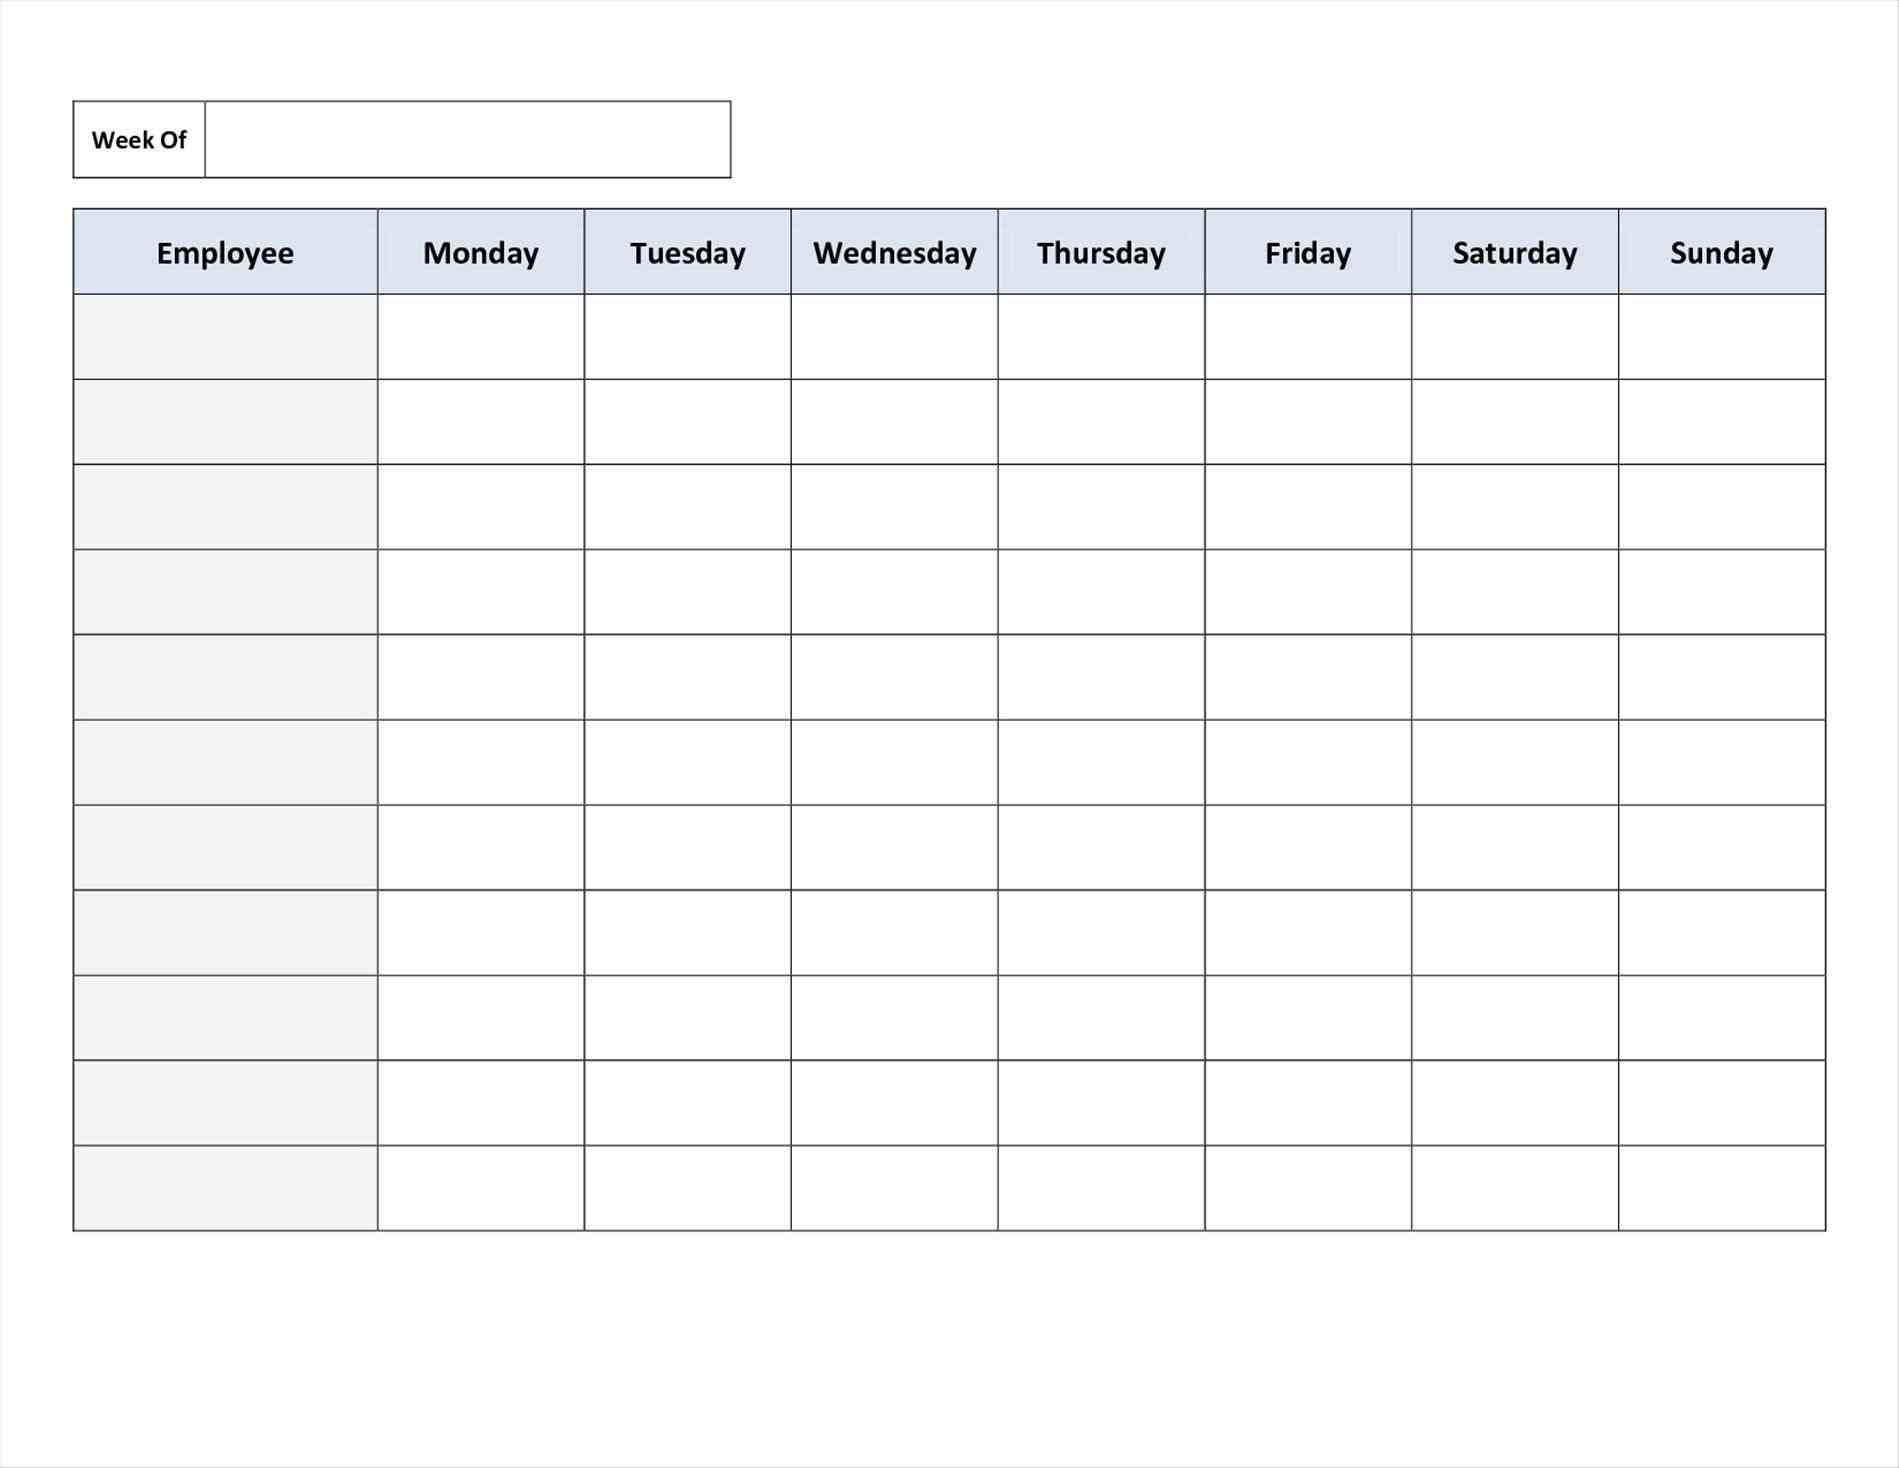 word free printable templates schedule calendars Employee Work Calendars calendar for word free printable templates schedule work commonpenceco work Employee